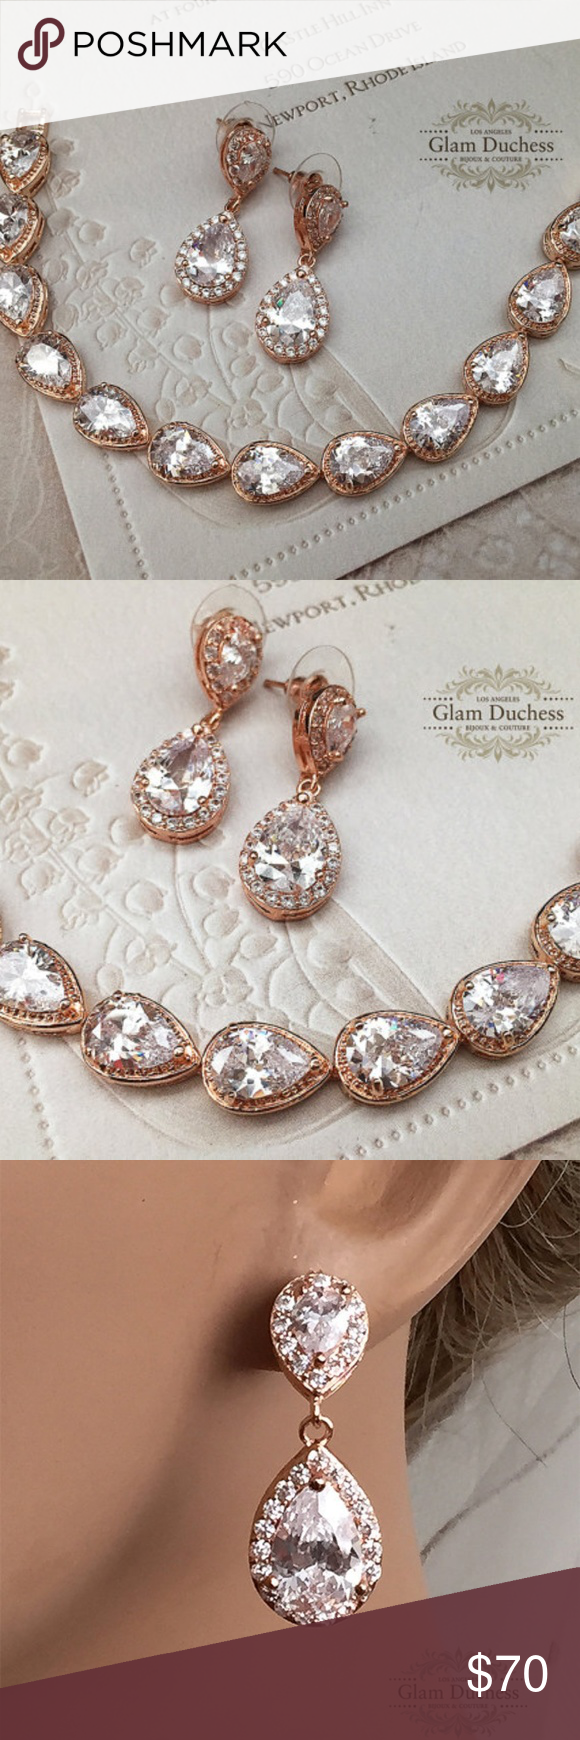 Rose gold teardrop cz crystal bracelet earring set my posh picks